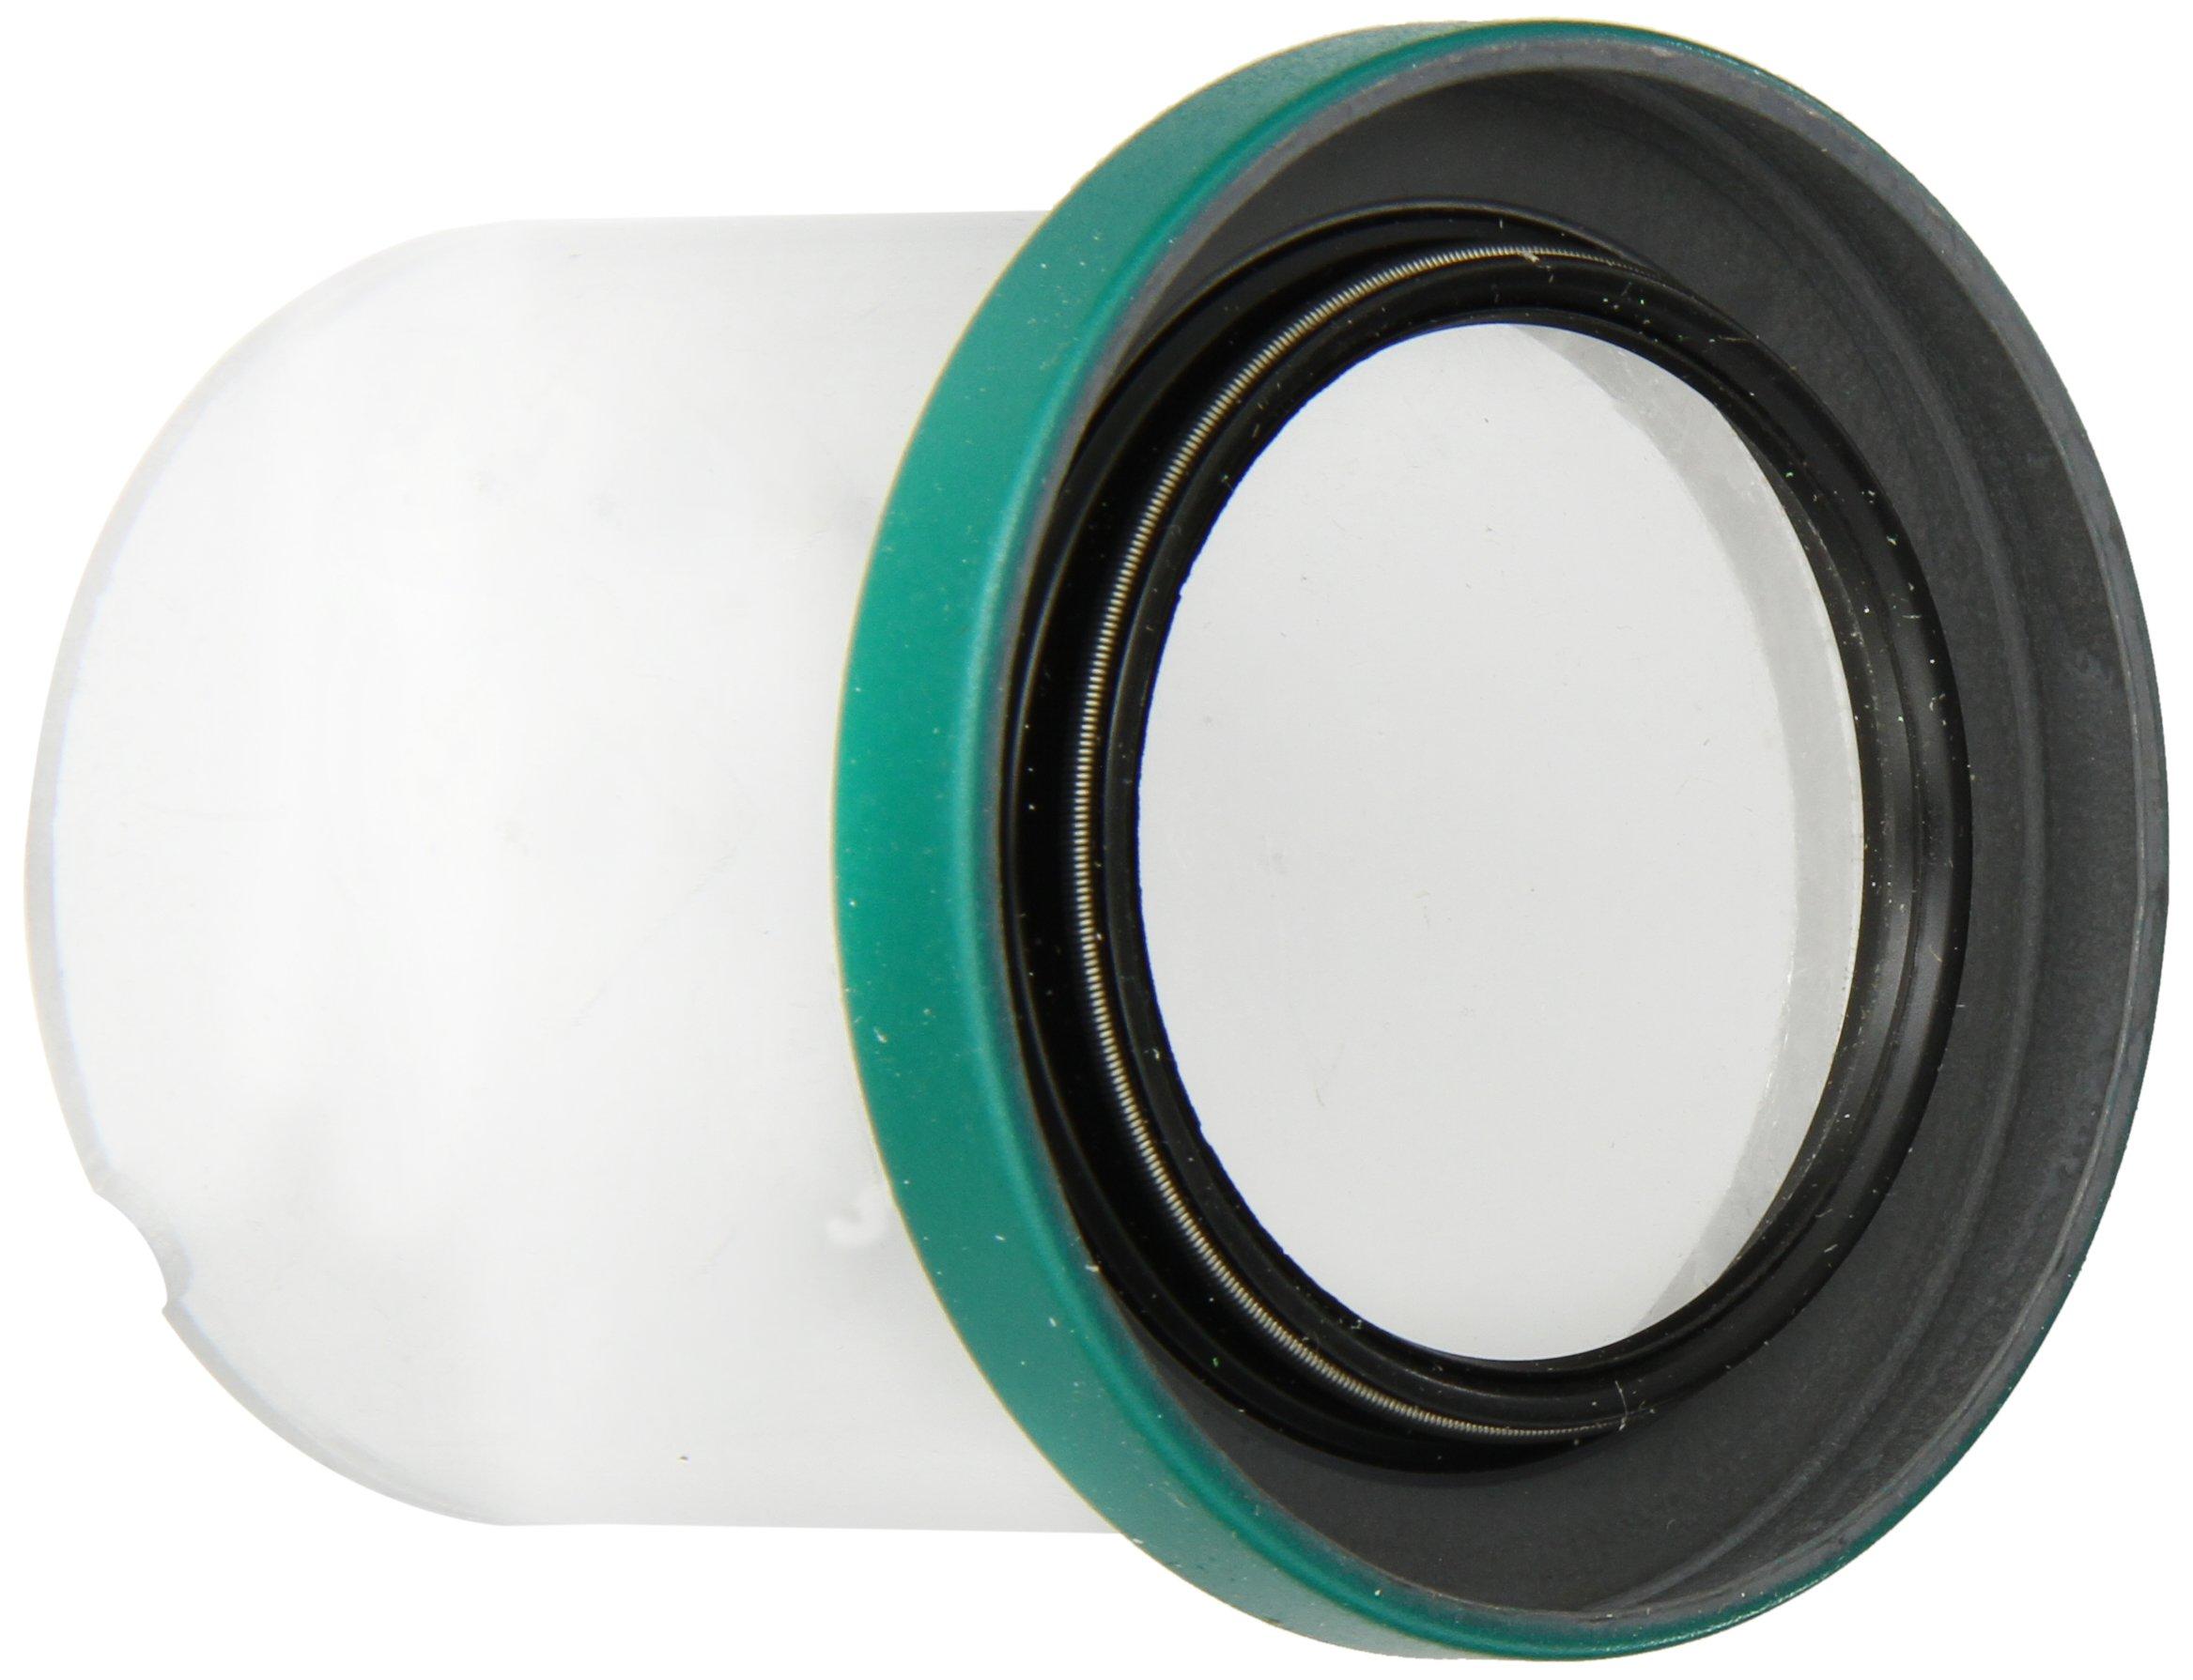 SKF 16113 LDS & Small Bore Seal, R Lip Code, CRW1 Style, Inch, 1.625'' Shaft Diameter, 2.437'' Bore Diameter, 0.313'' Width